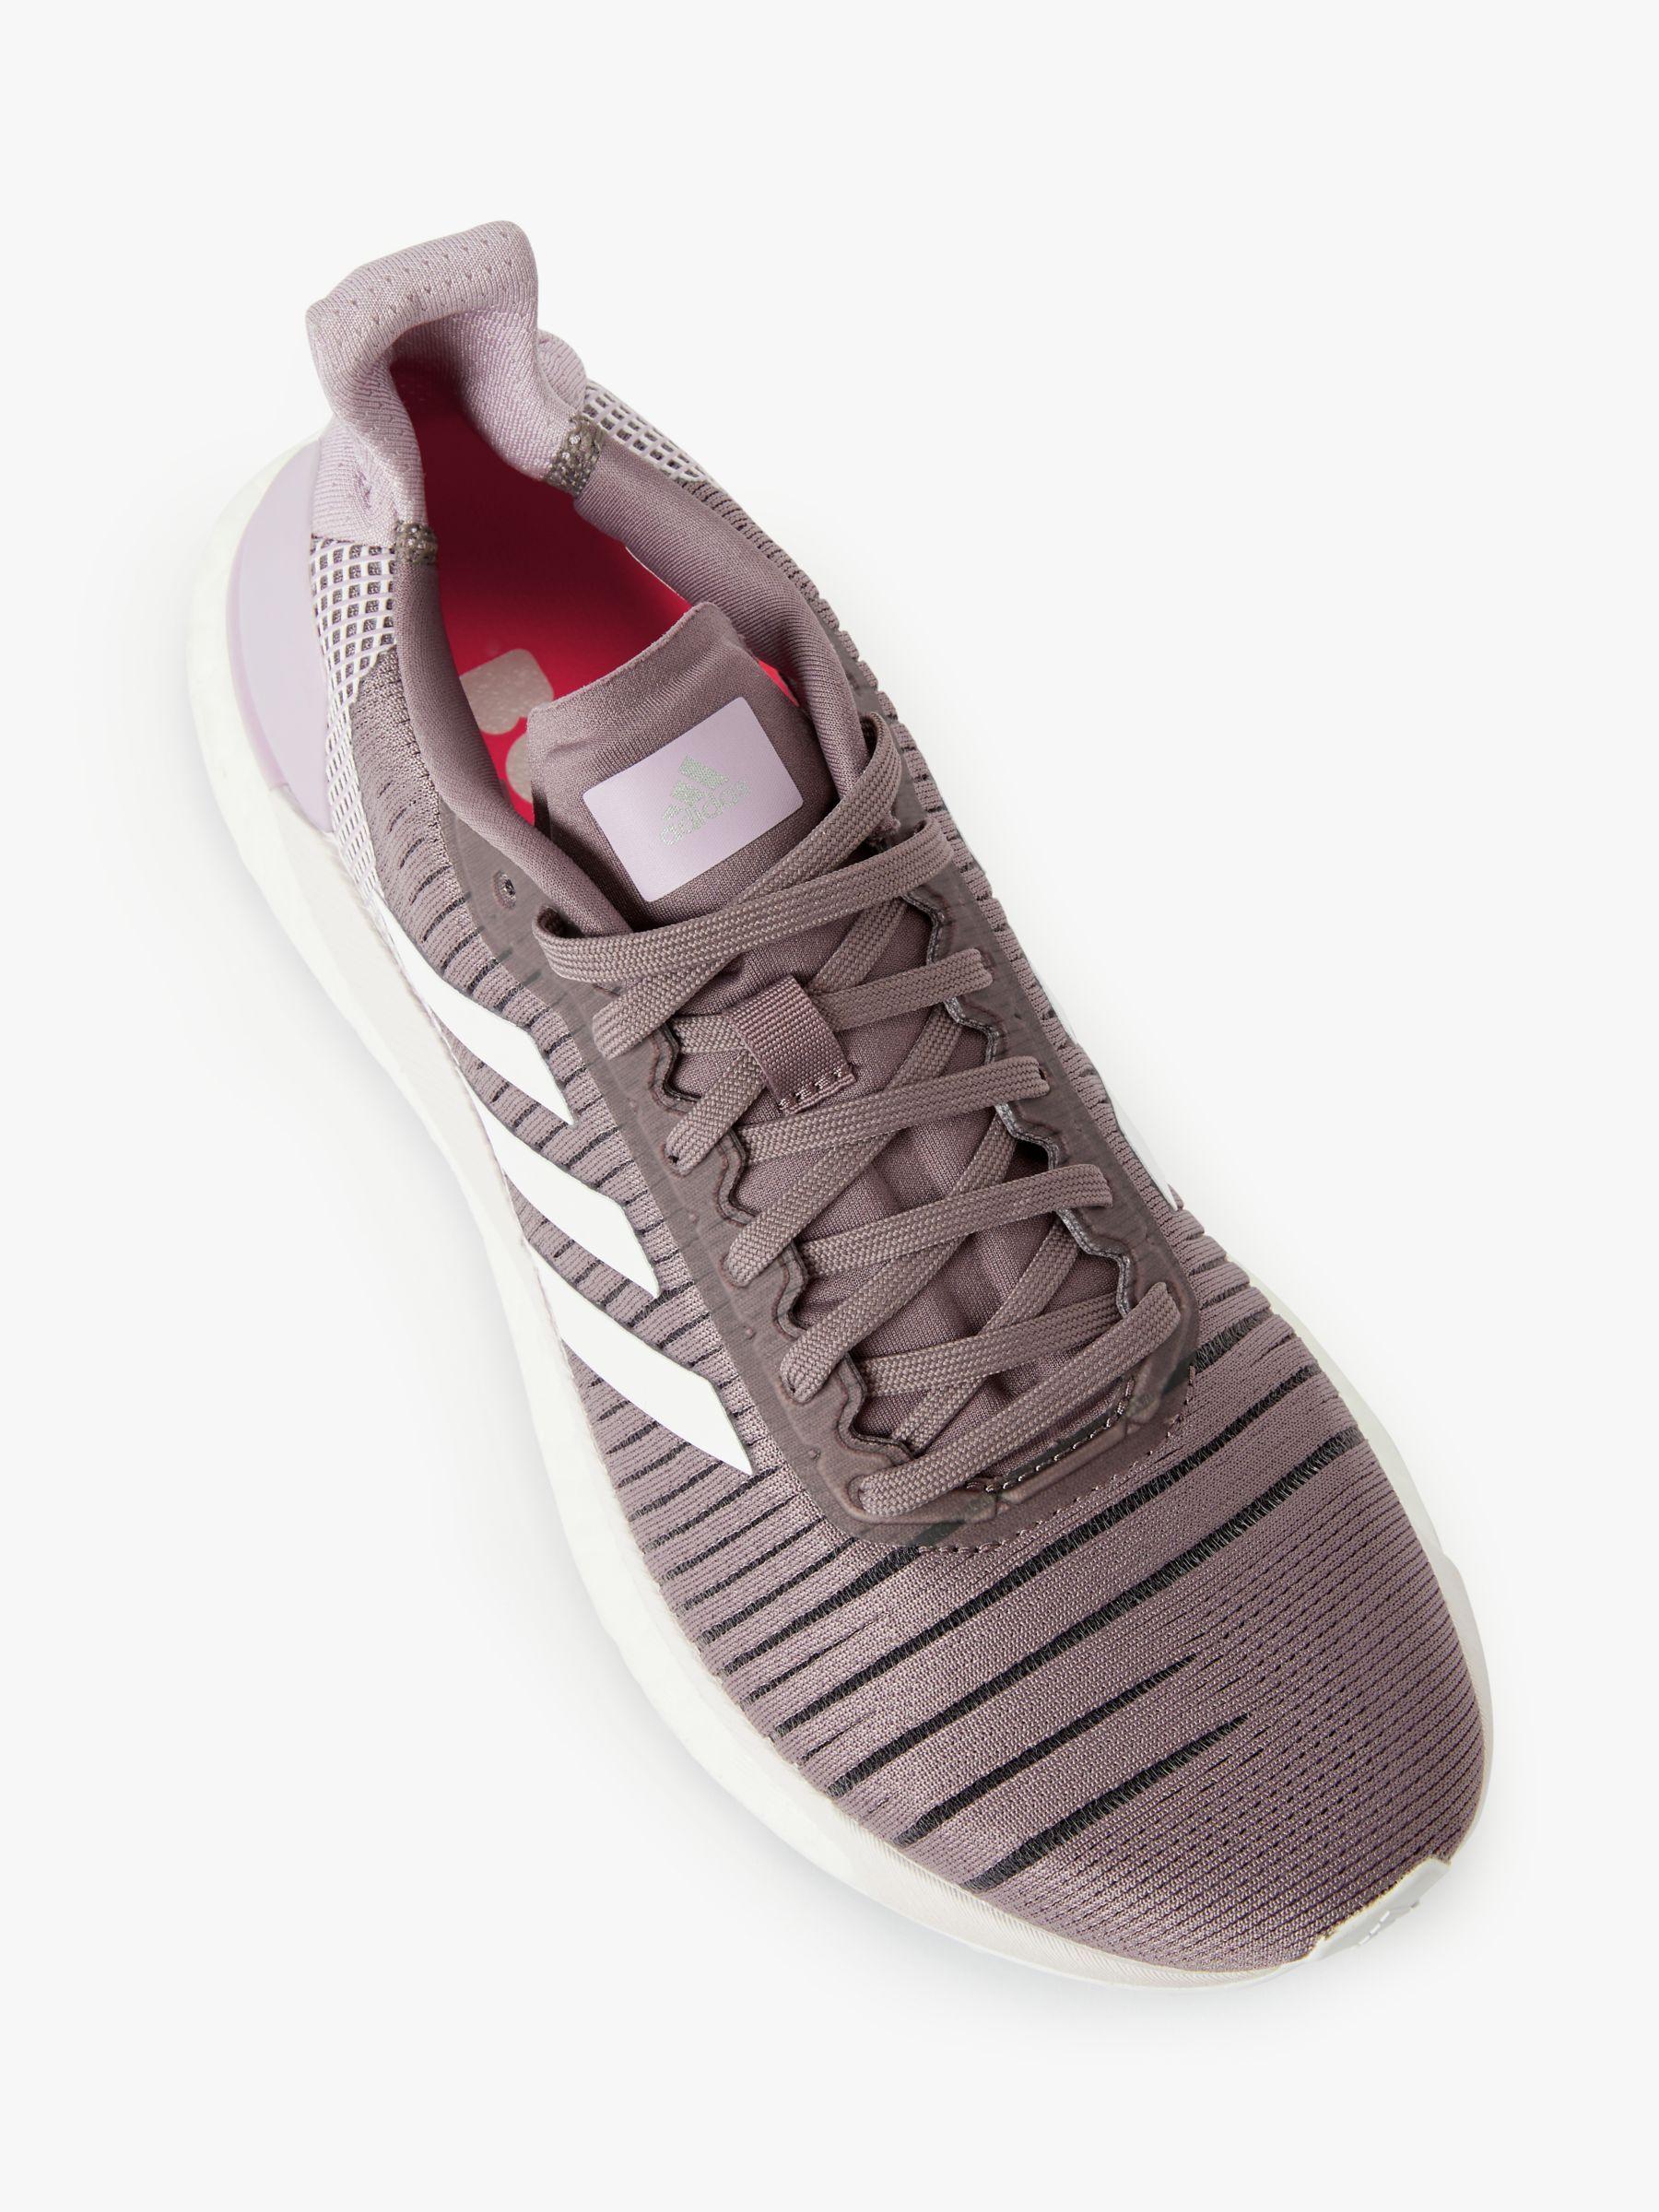 adidas Solar Glide 19 Women's Running Shoes, Blue TintFTWR